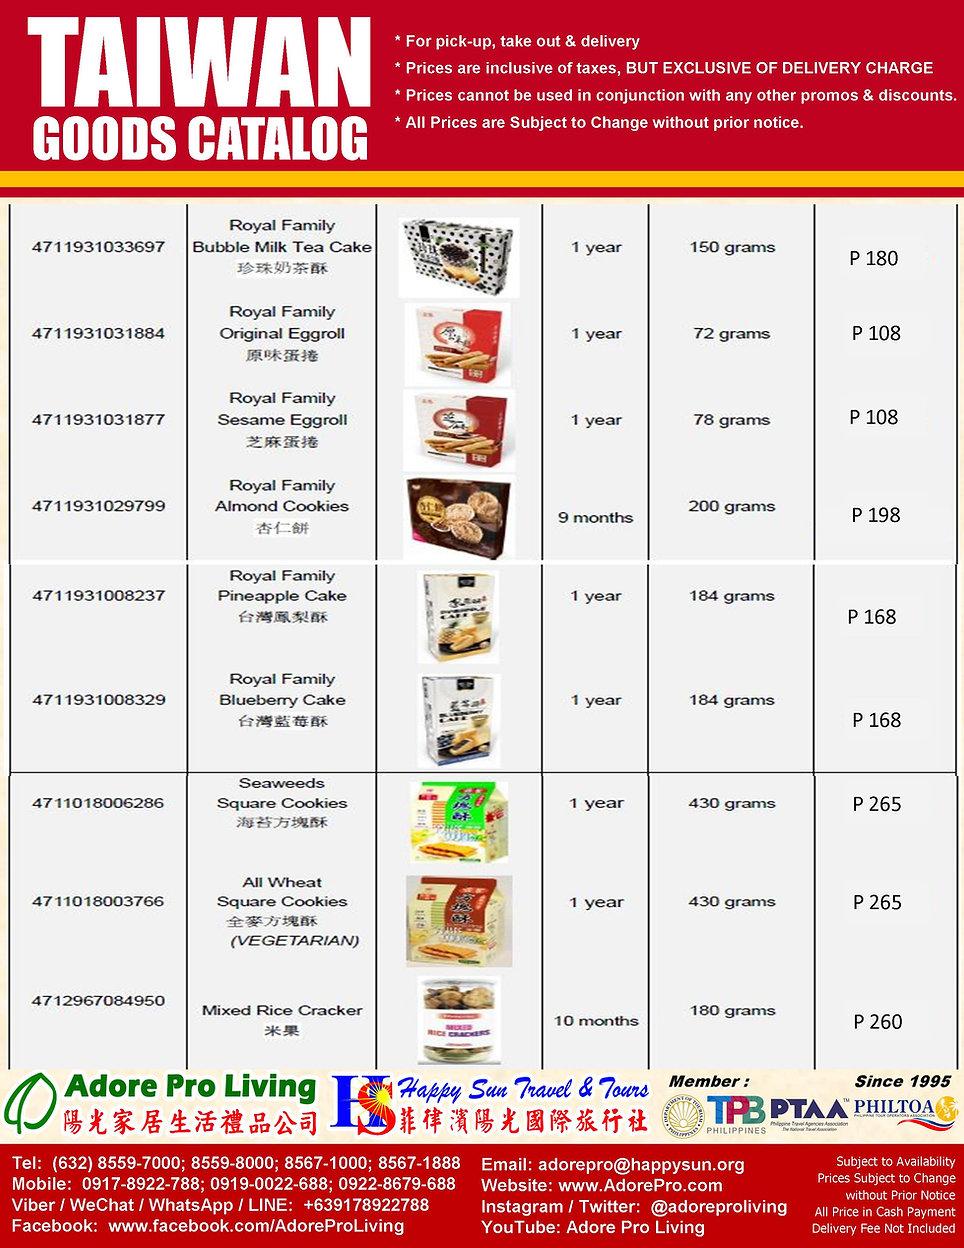 P7_Taiwan Goods Catalog_202009119.jpg